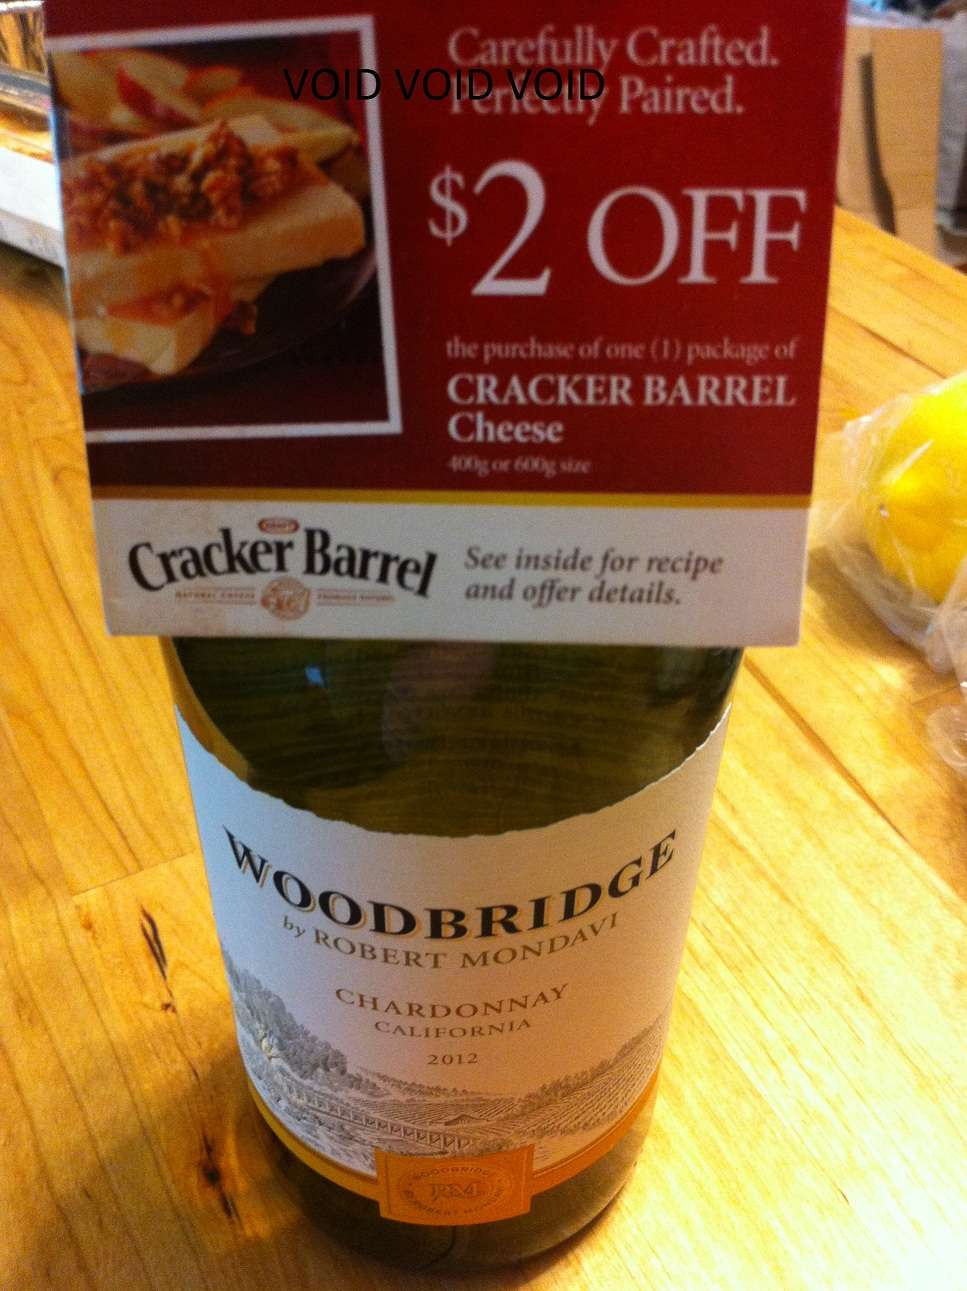 Woodbridge wine coupon printable : Freecharge coupons 2018 december